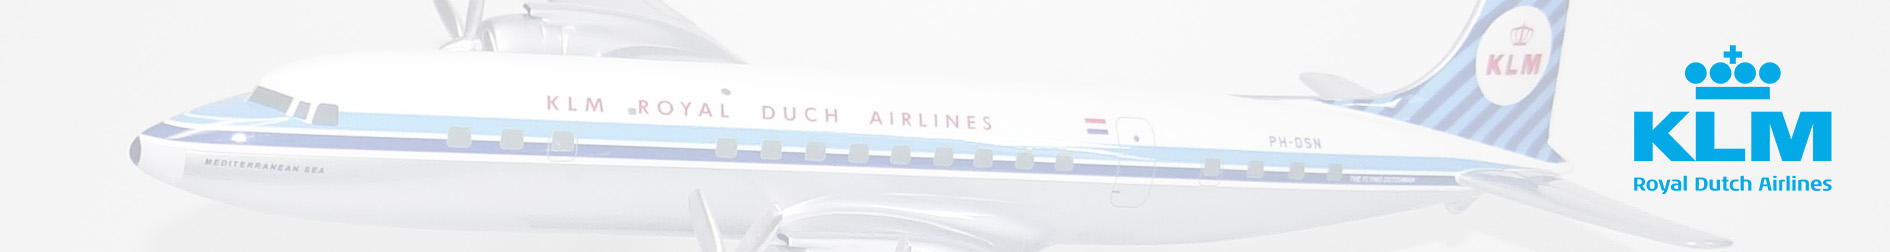 klm-royal-duch-airlines.jpg